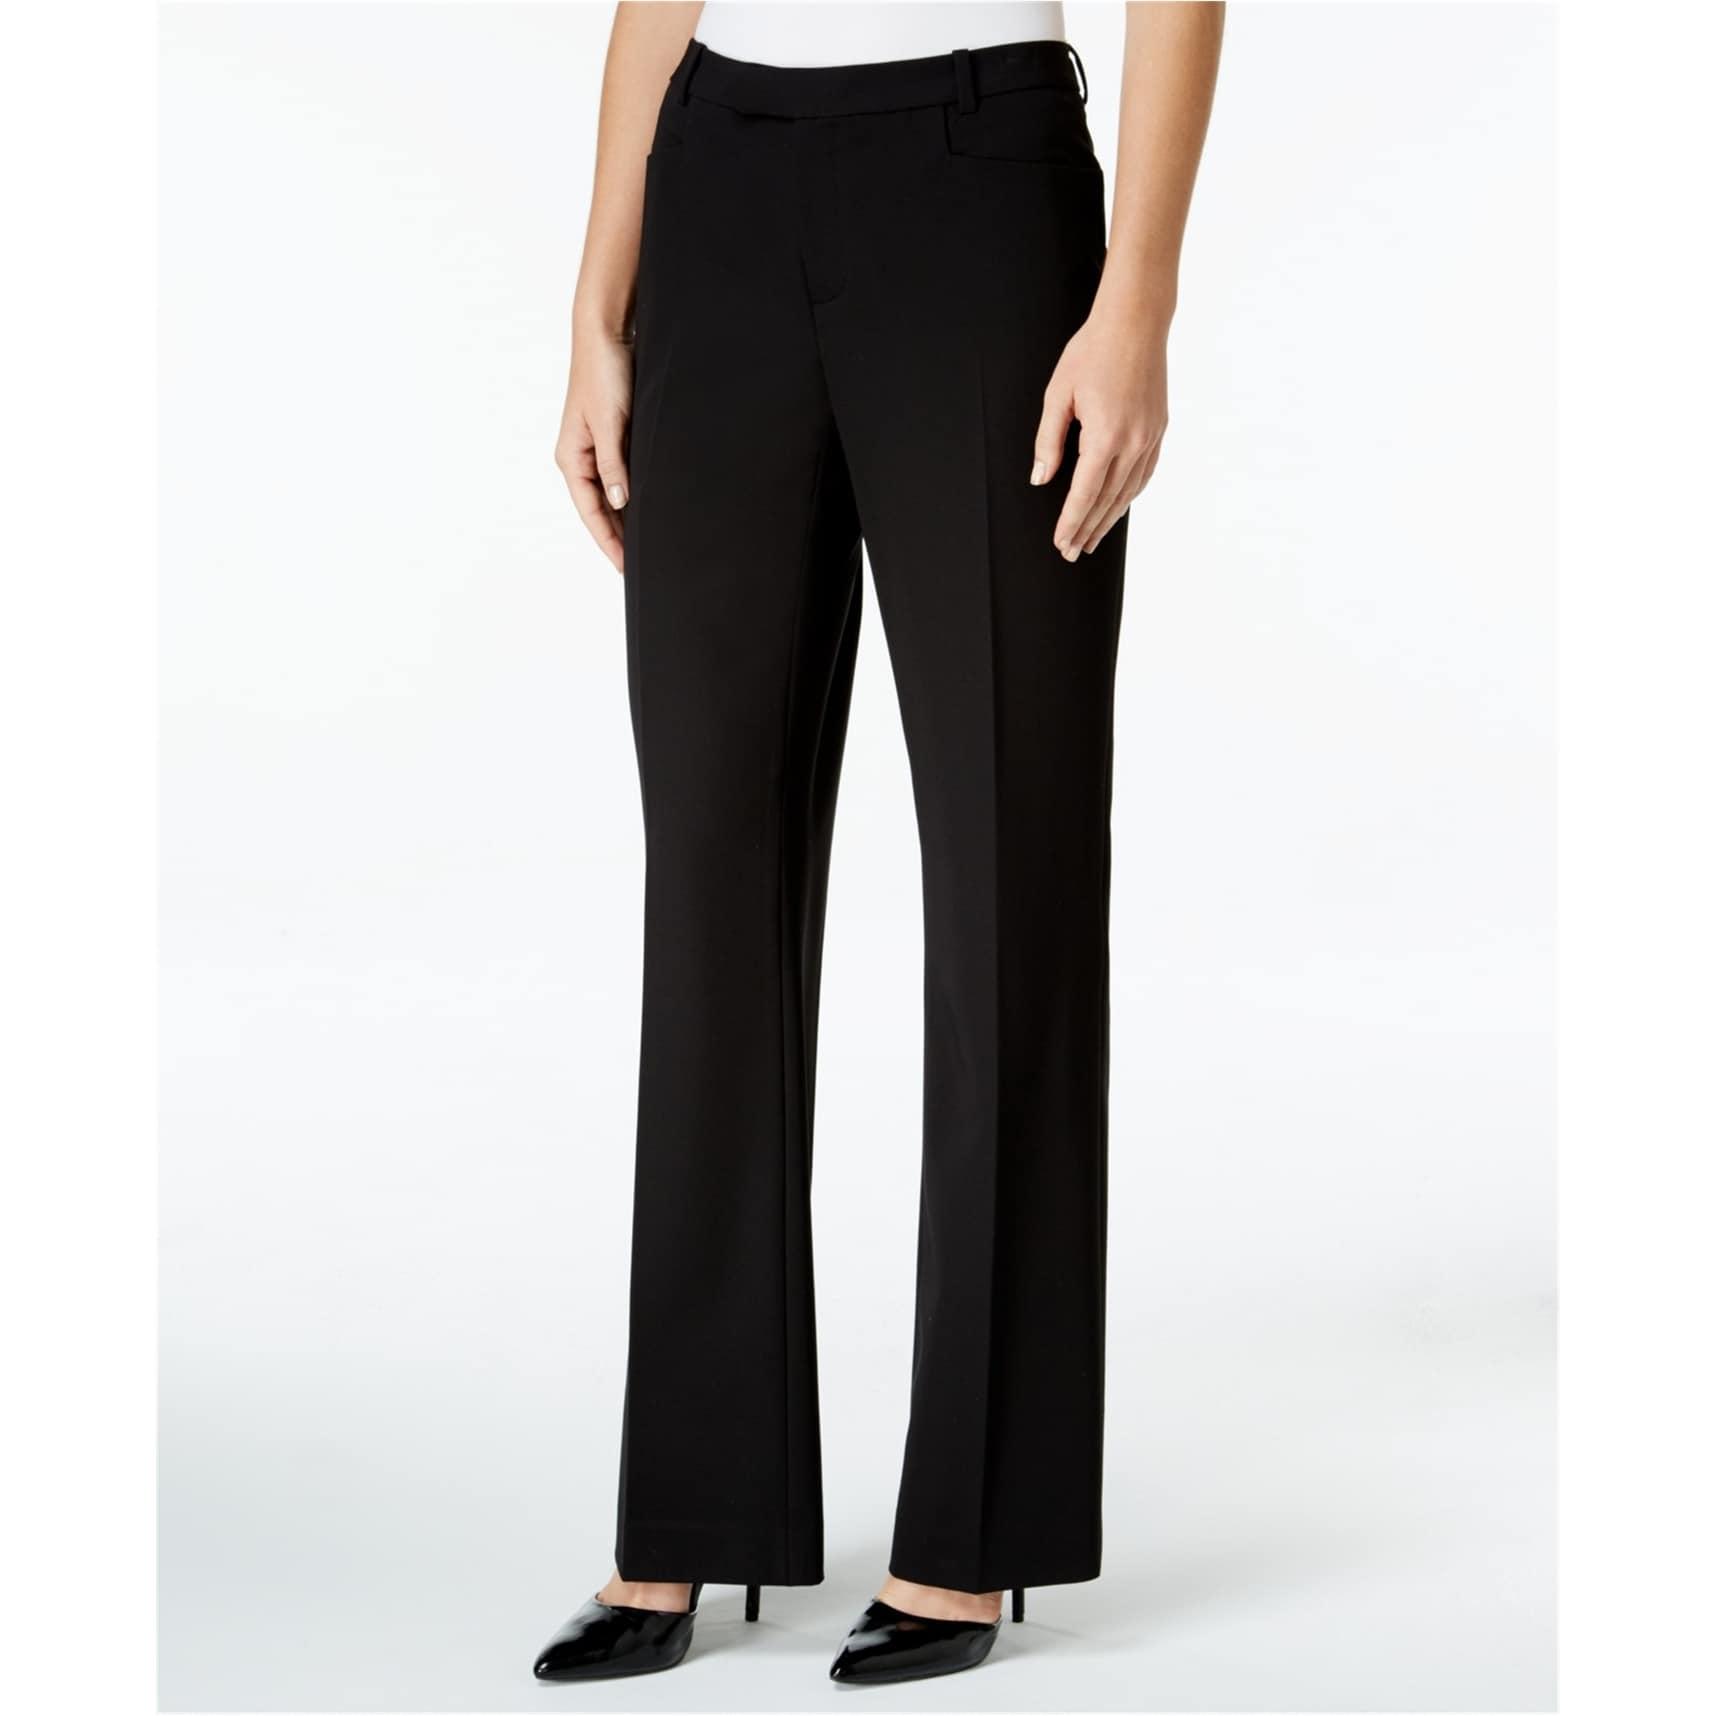 TOMMY HILFIGER NEW Women/'s Princeton Plaid Slim Leg Dress Pants TEDO